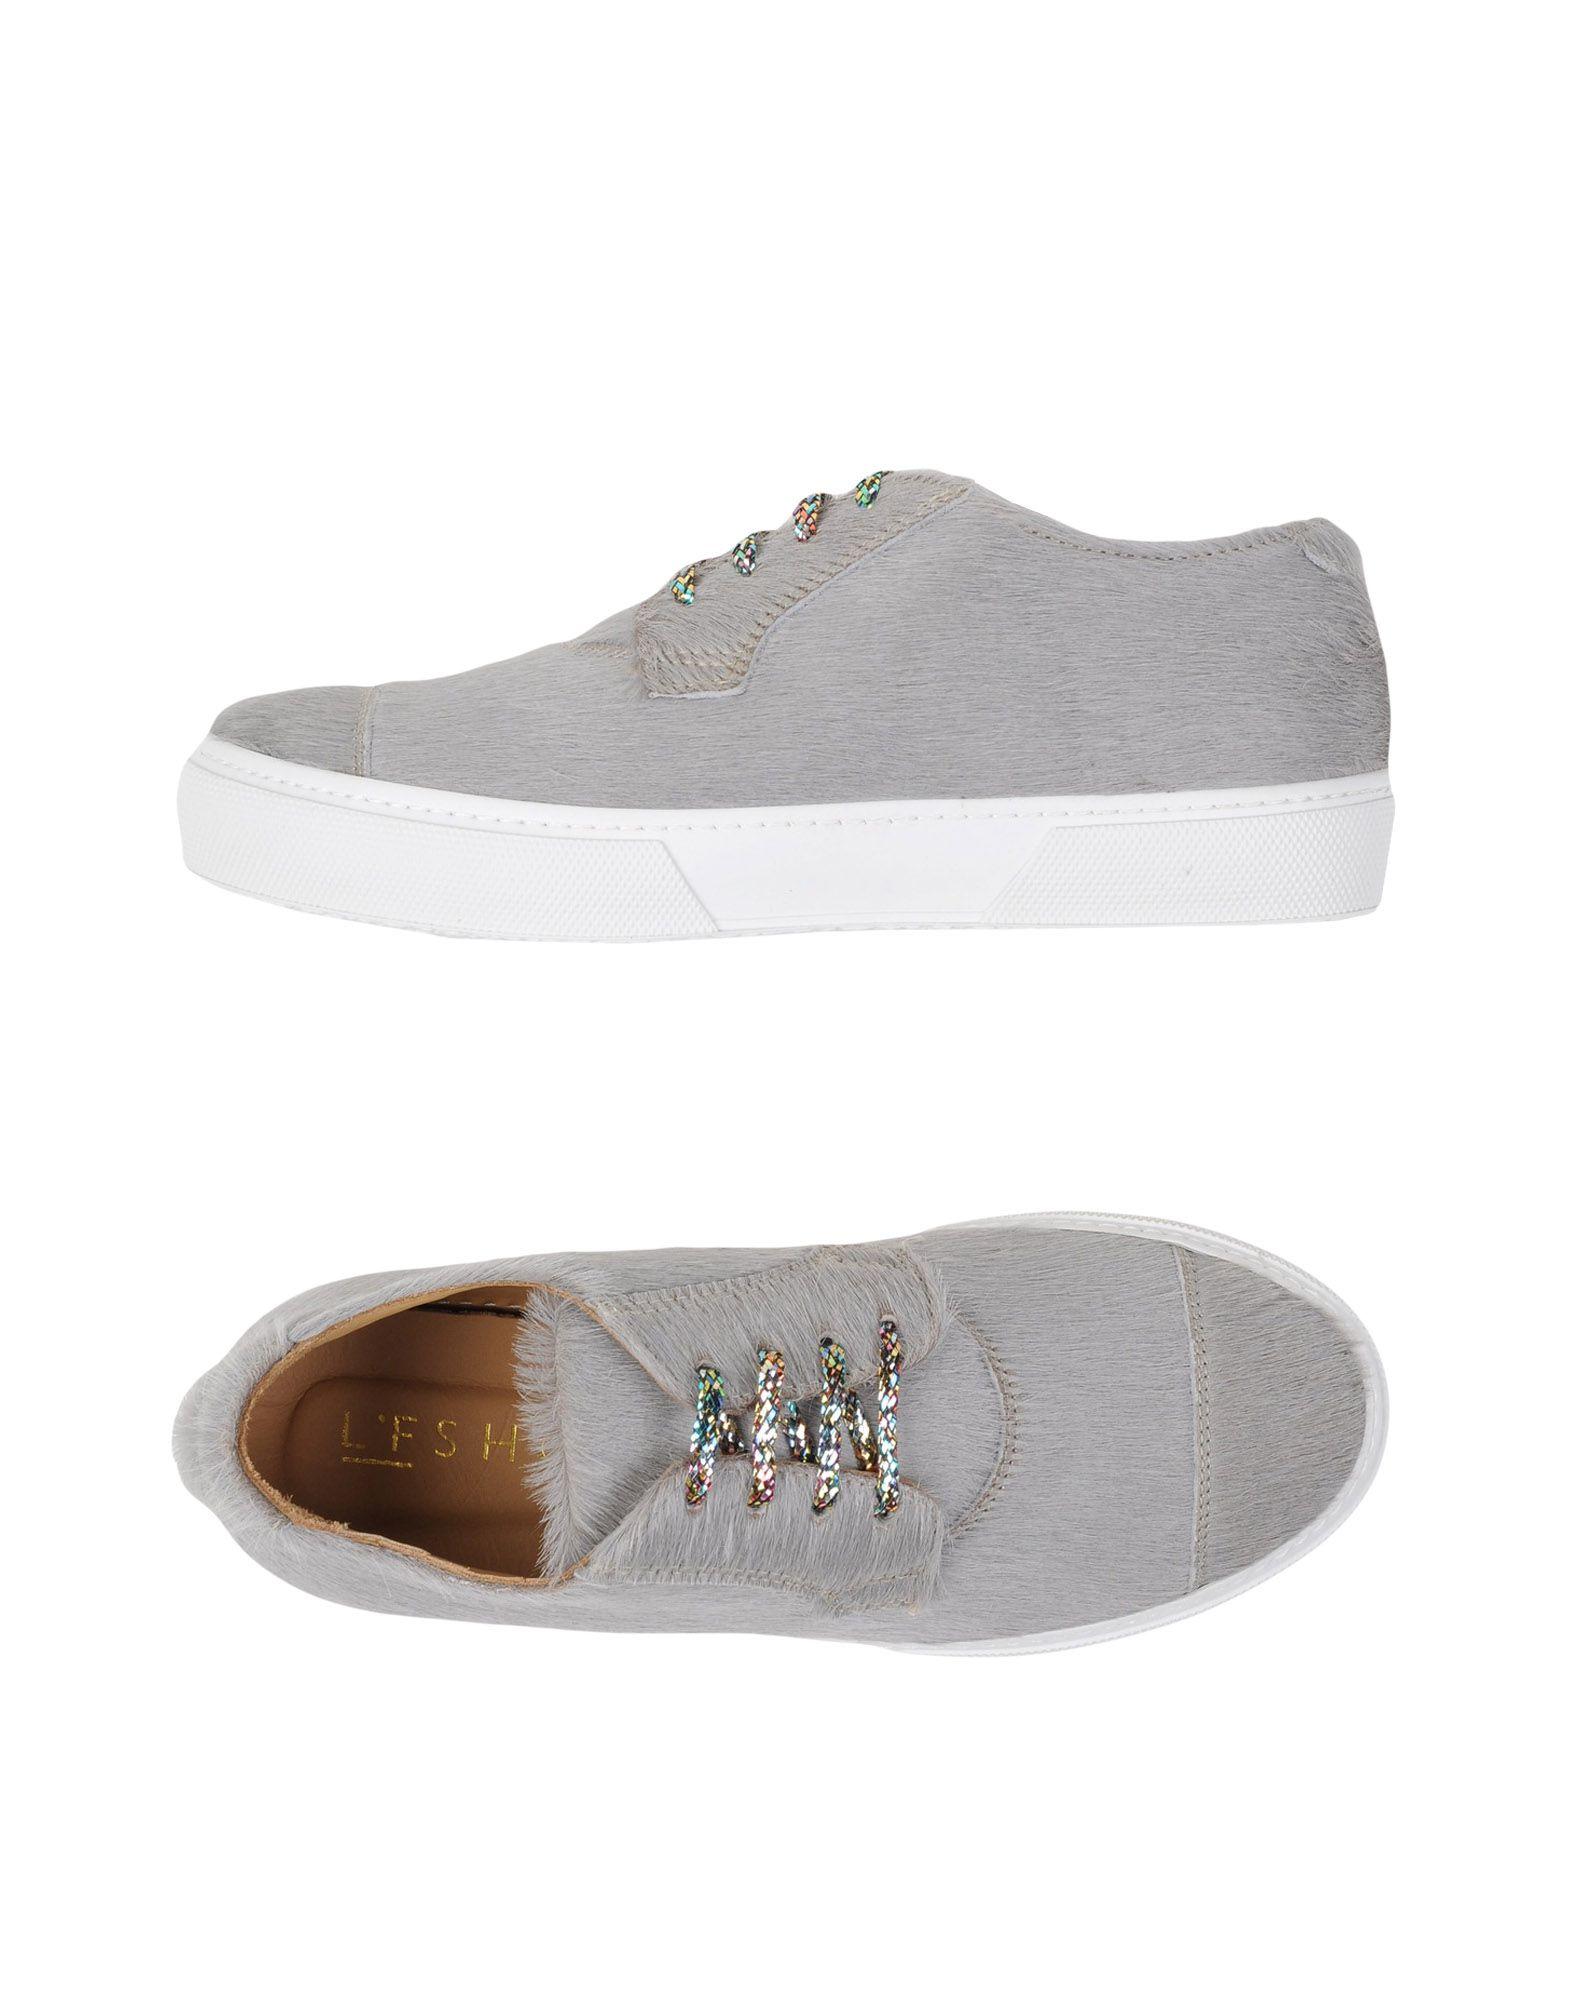 Sneakers Lf Shoes Femme - Sneakers Lf Shoes sur